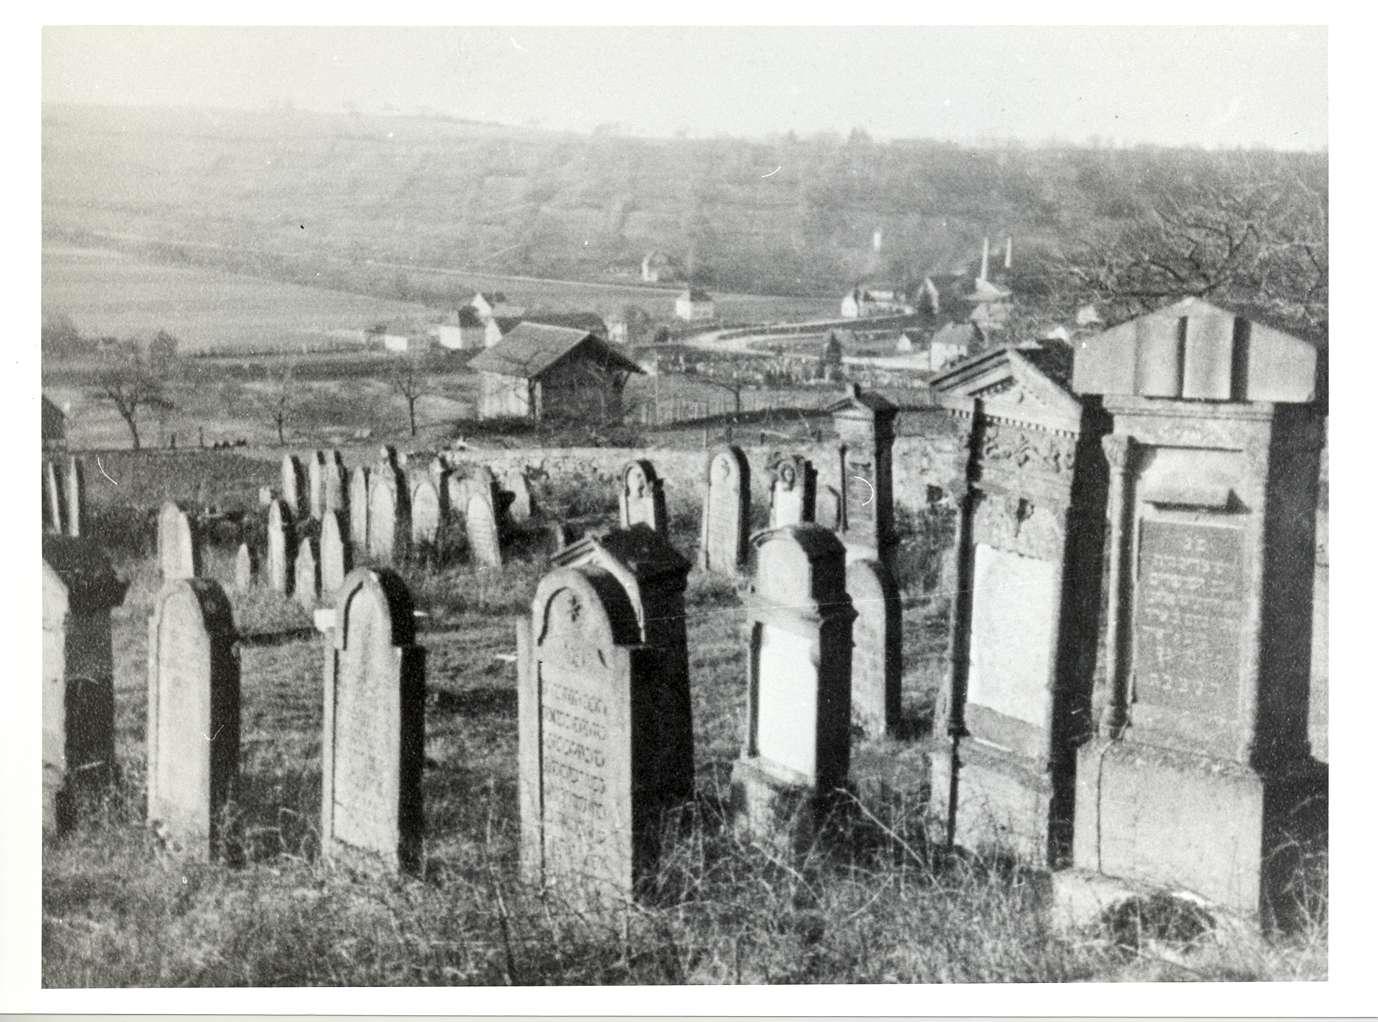 Neudenau, HN; Jüdischer Friedhof, Gräber, Bild 1